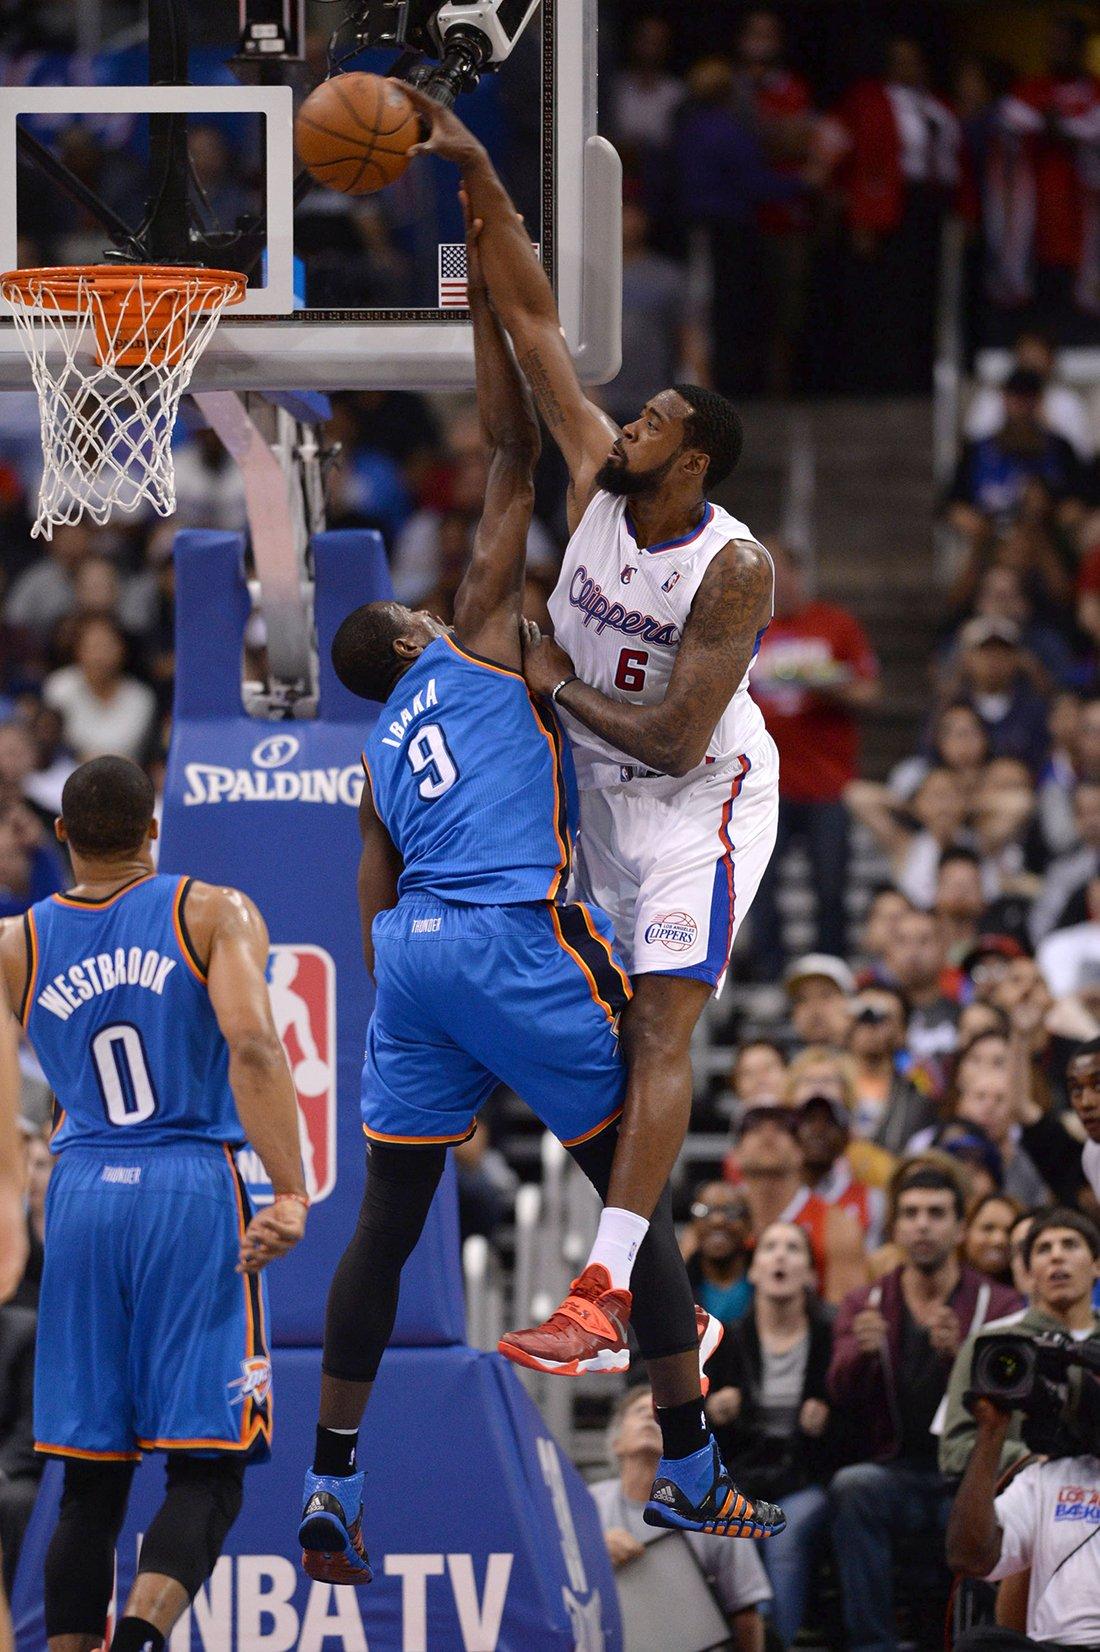 SIGUIENTE ROUND3 clippers okc en viva basquet